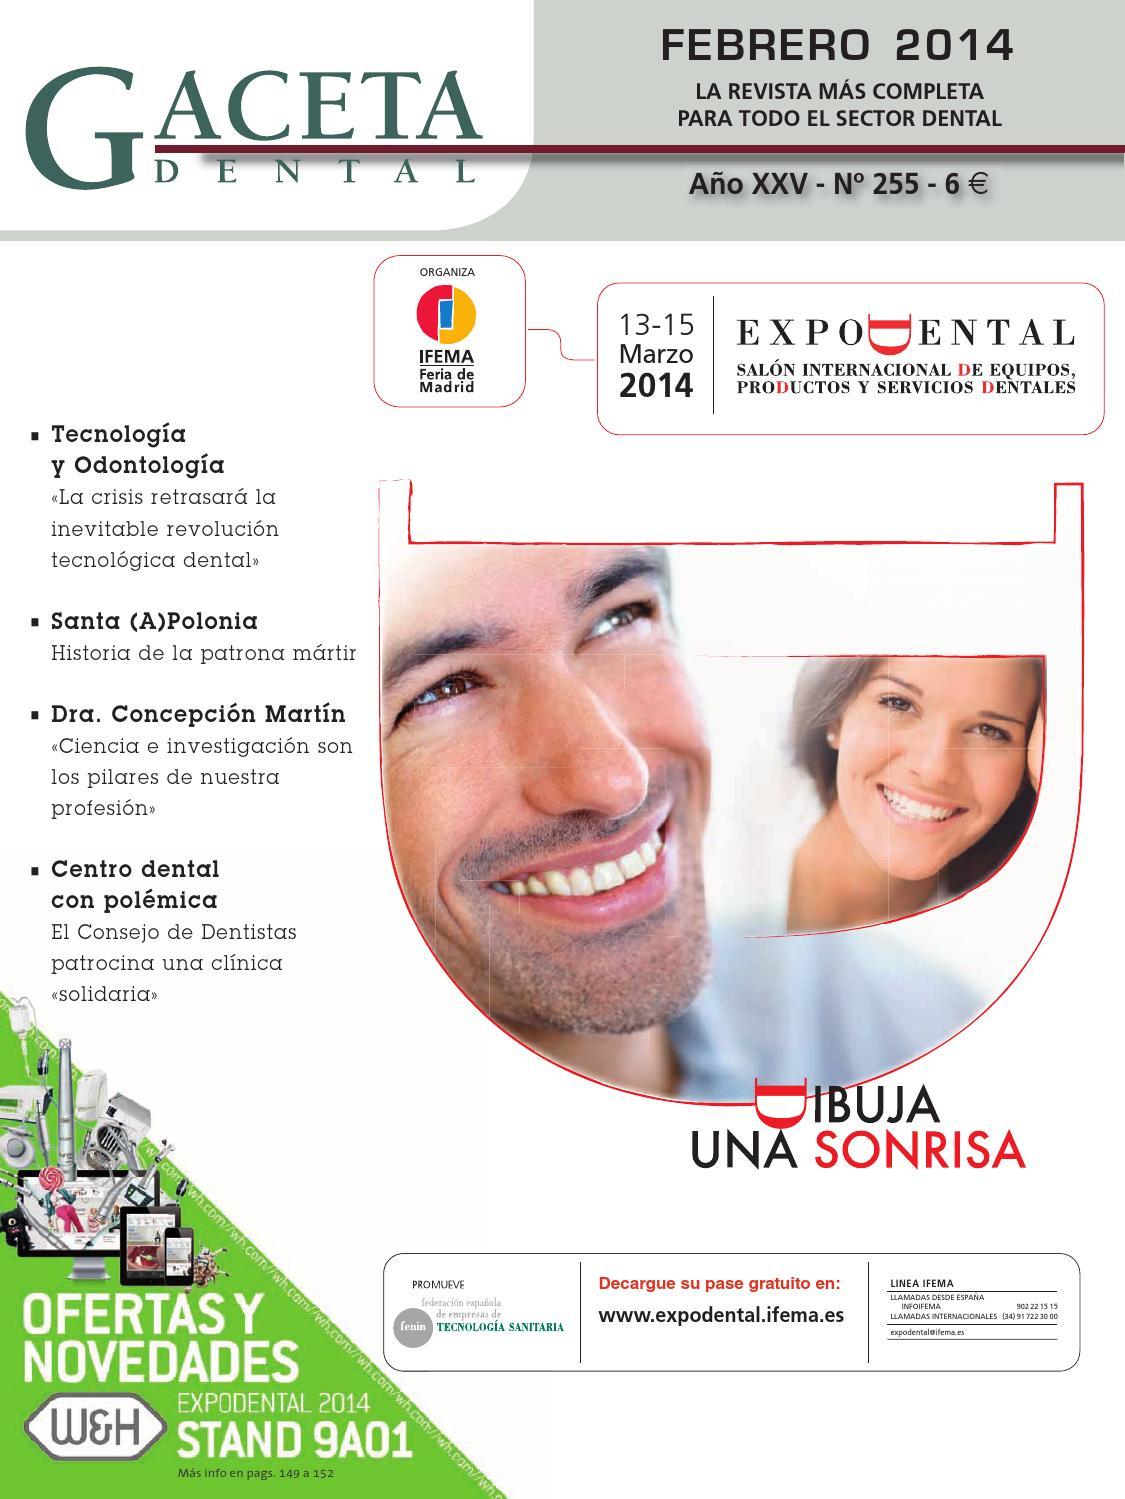 Gaceta Dental - 255 by Peldaño - issuu f7e8b0984561